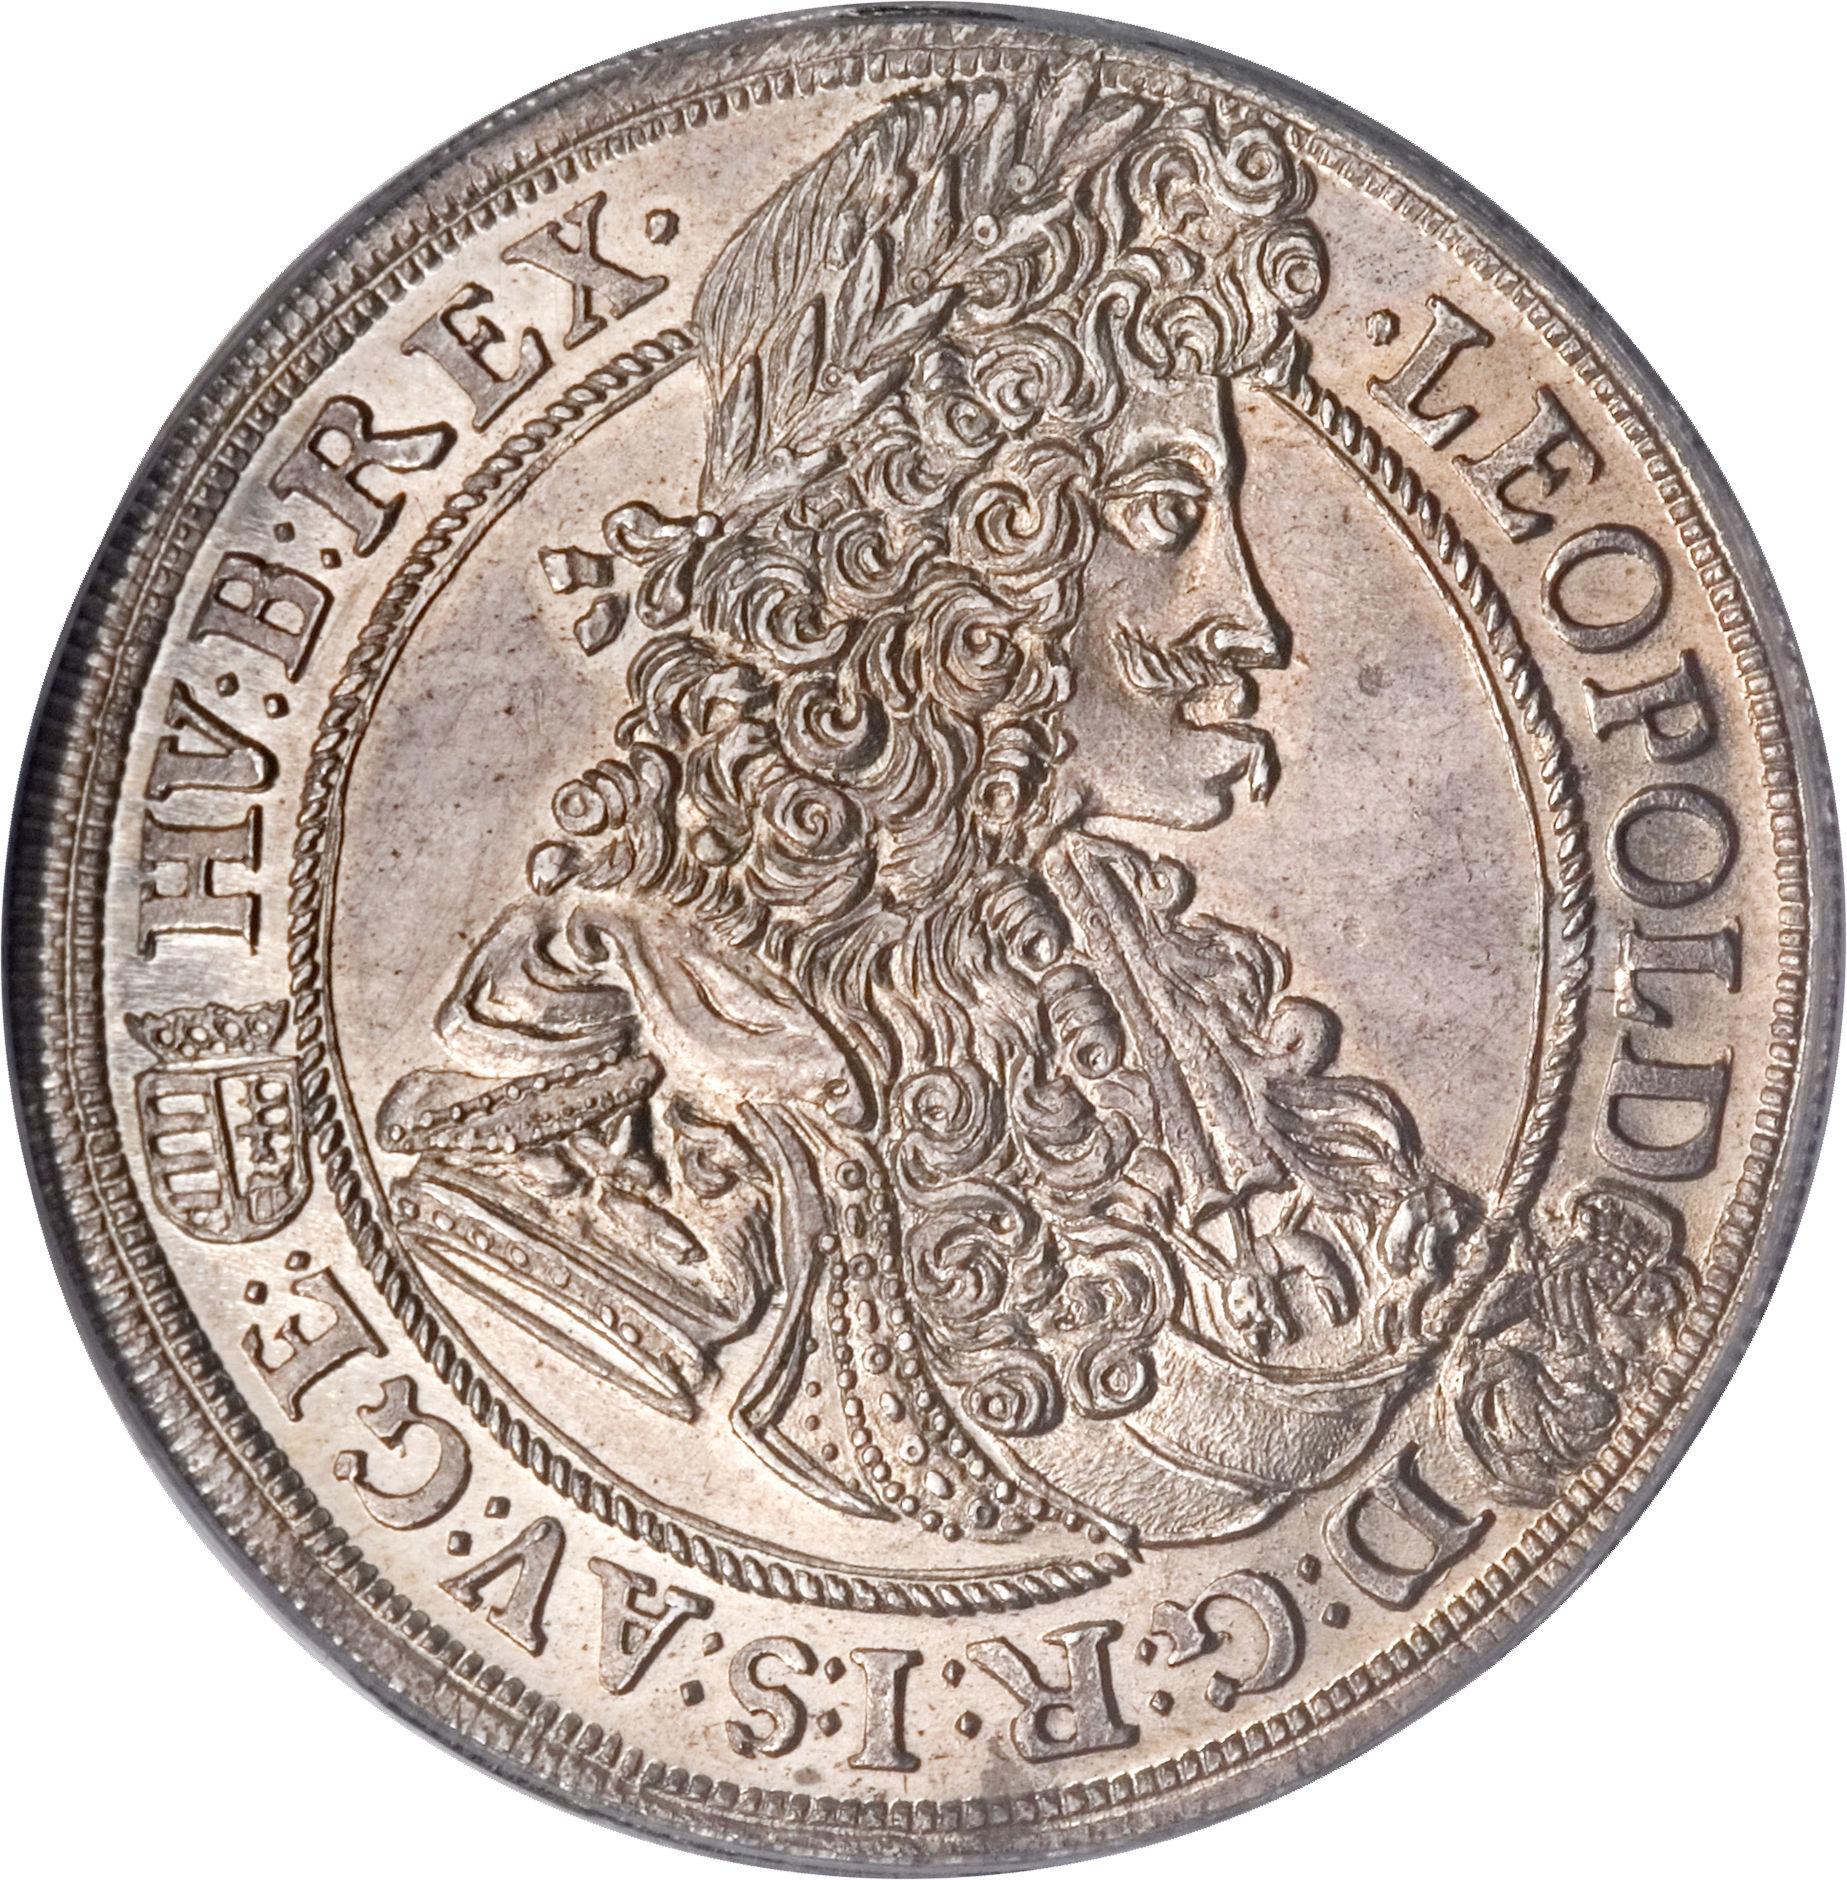 2ef0c3891 1/2 Thaler - Leopold I (1690-1699) Hungary KM# 220 - CoinsBook